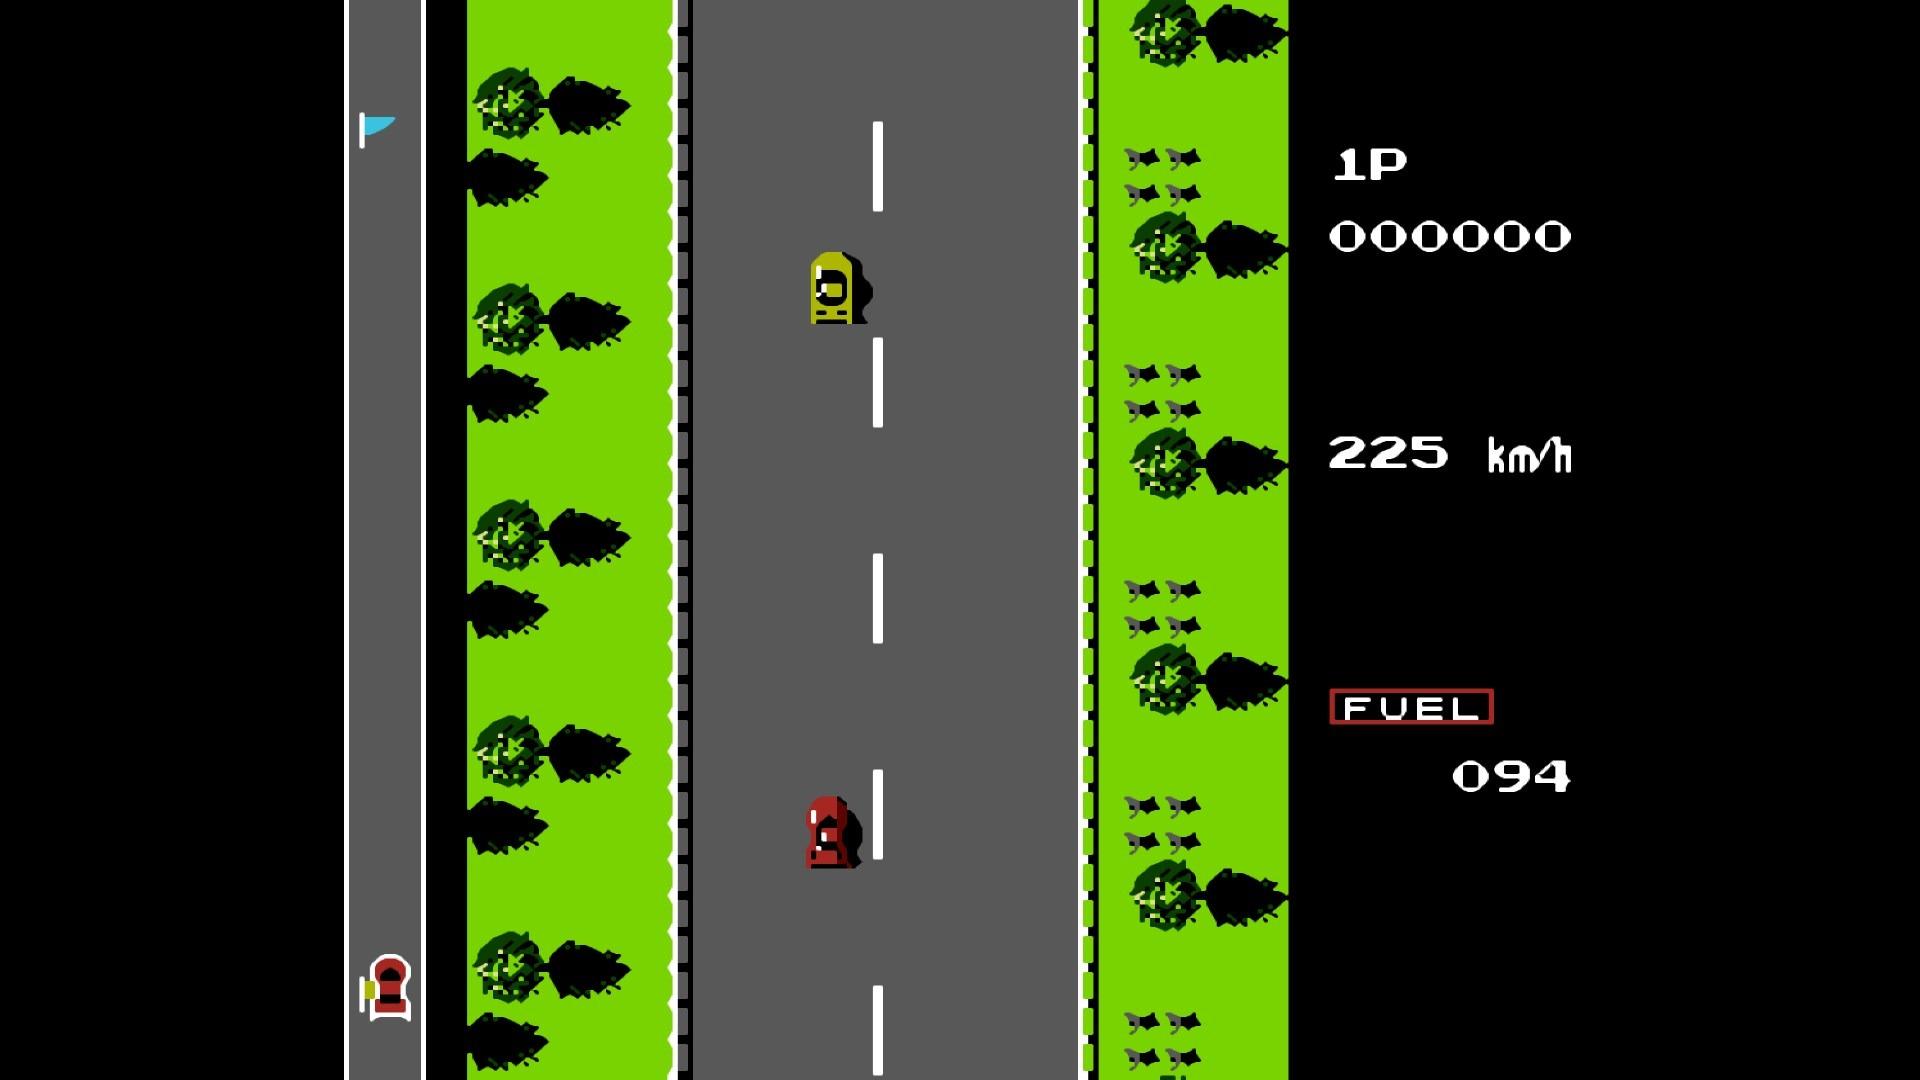 PuNES modo de pantalla completa Road Fighter